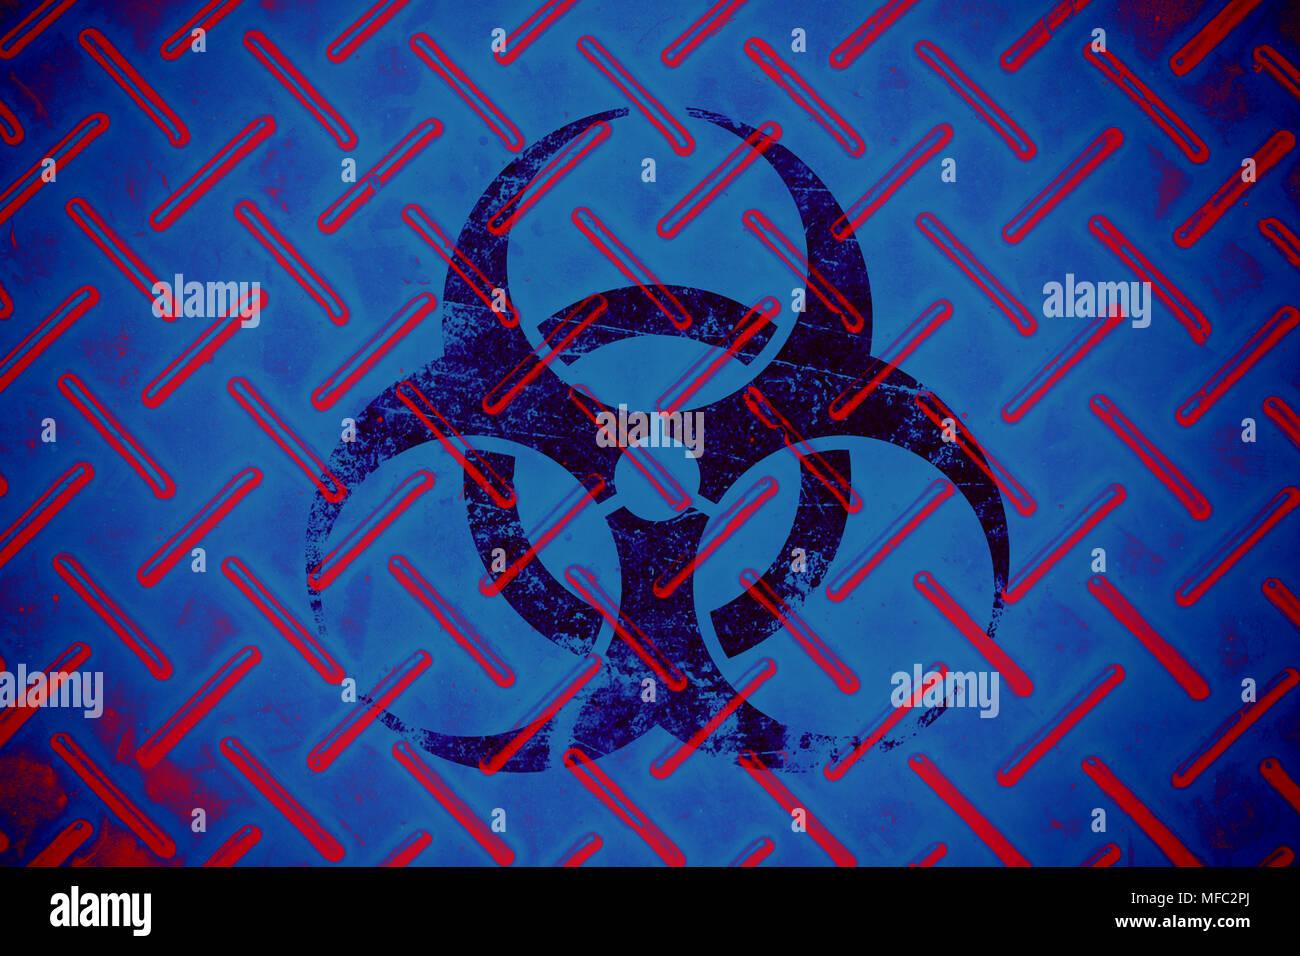 Bio Hazard epidemic chemical virus alert sign for background - Stock Image